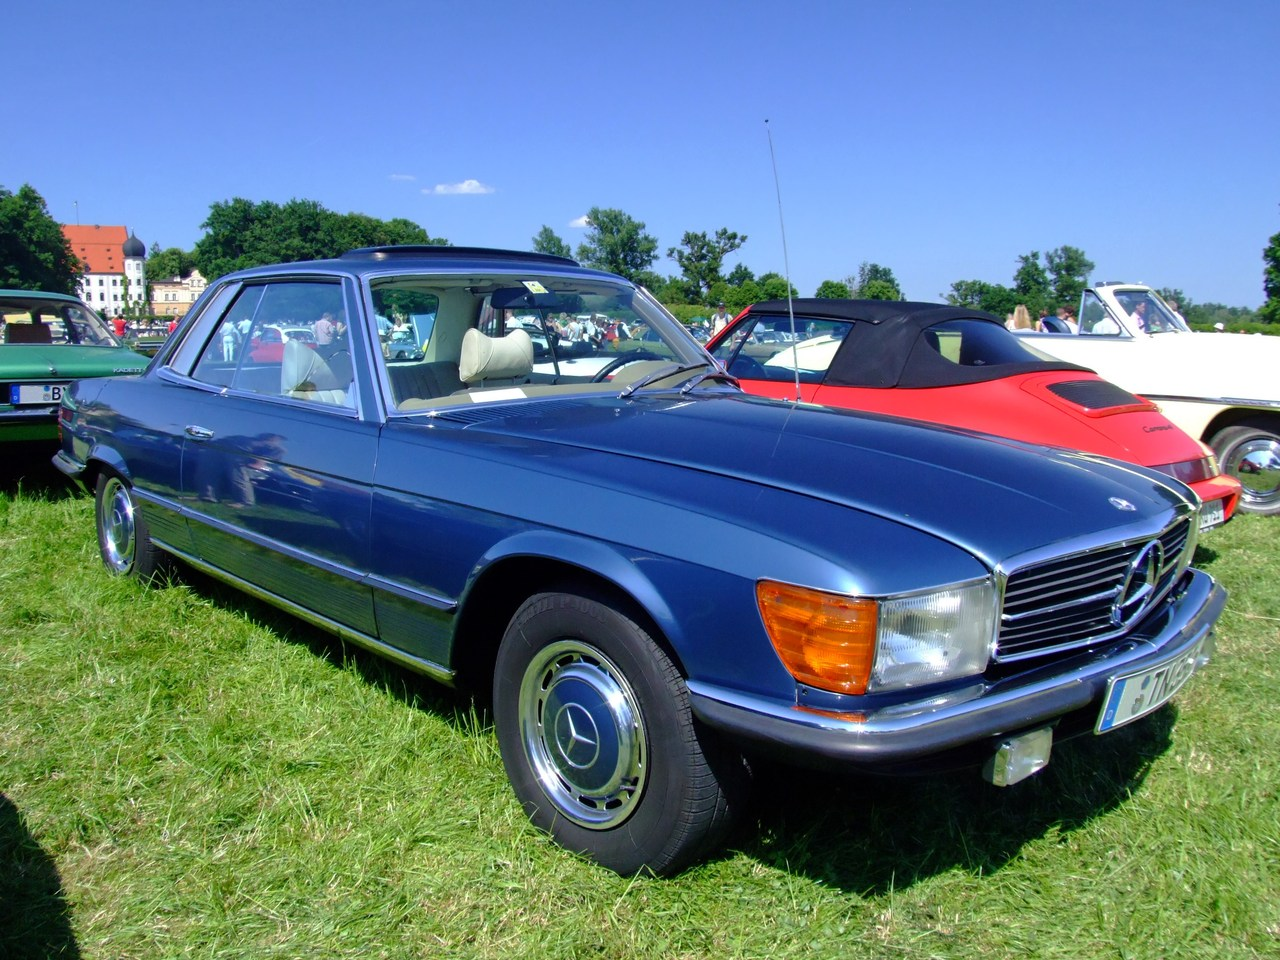 Mercedes benz 350 slc photos reviews news specs buy car for Mercedes benz 350 slc